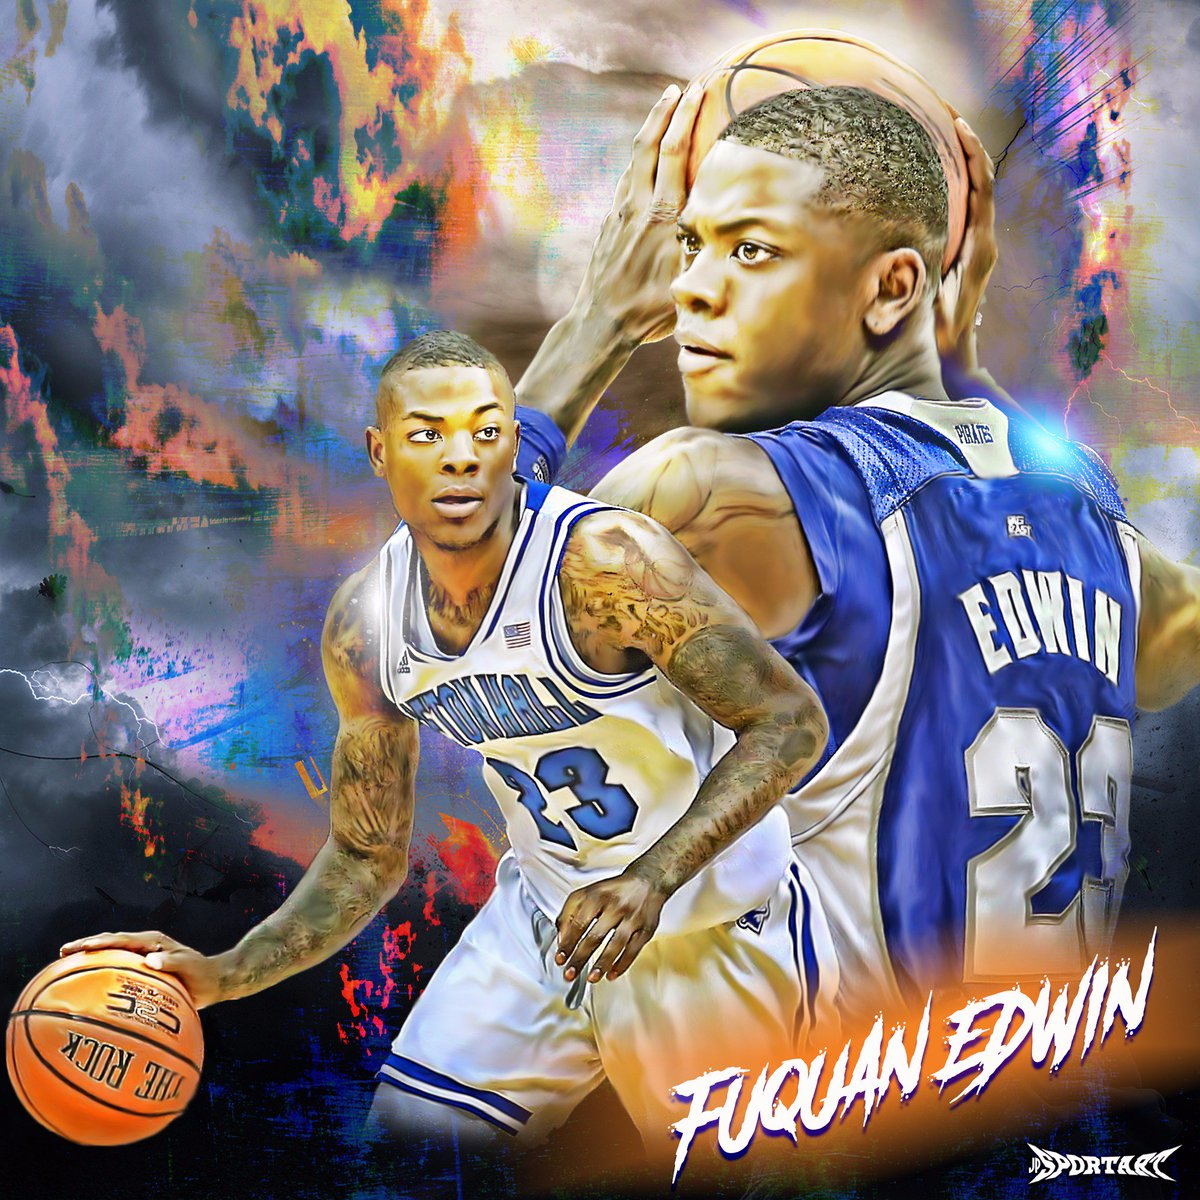 Fuquan Edwin atrwork #karhubasket #basketball #artwork #SetonHall #HAL...